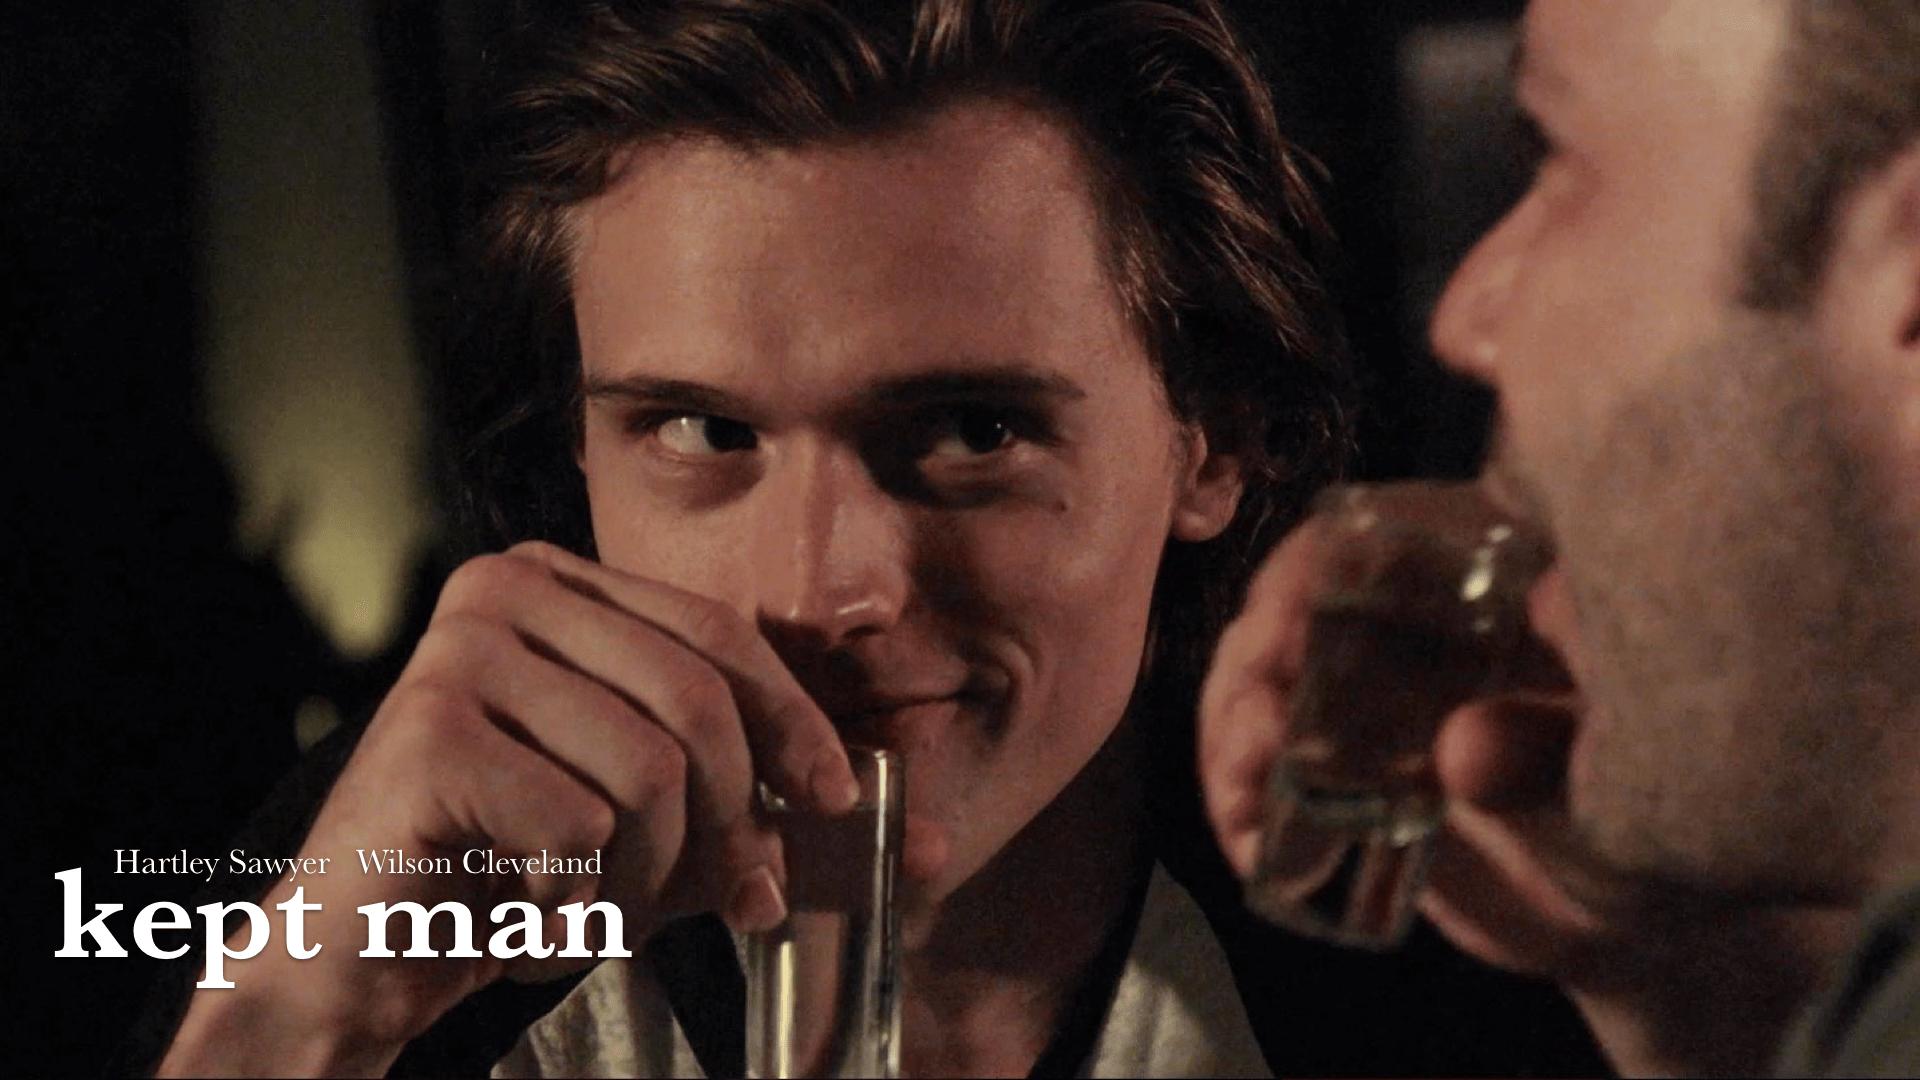 kept-man-hartley-sawyer-wilson-cleveland-horror-halloween-short-film.png